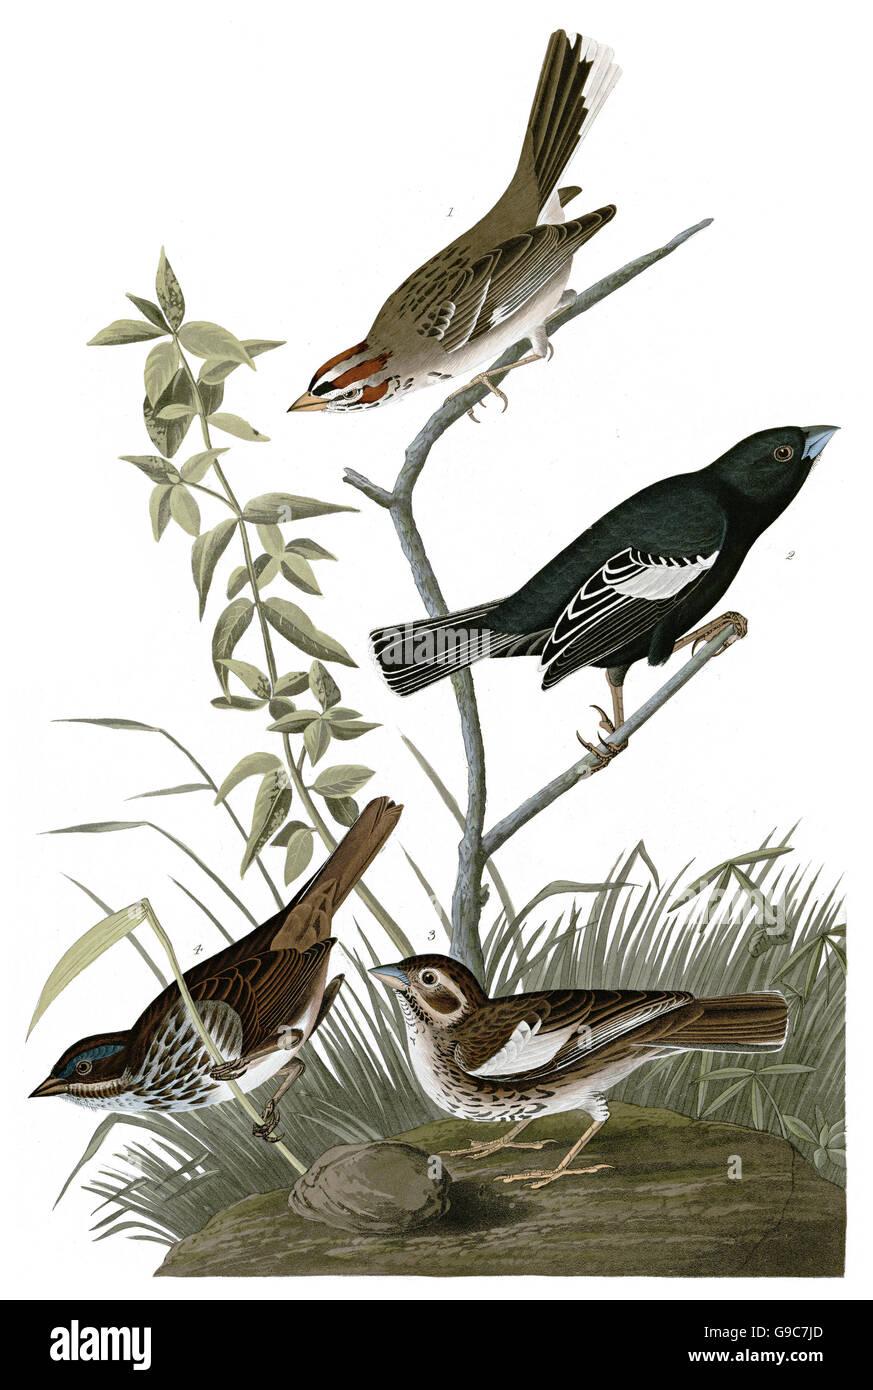 1 Lark Bunting, Calamospiza melanocorys, 2 Song Sparrow, Melospiza melodia, 3 Lark Sparrow, Chondestes grammacus, - Stock Image